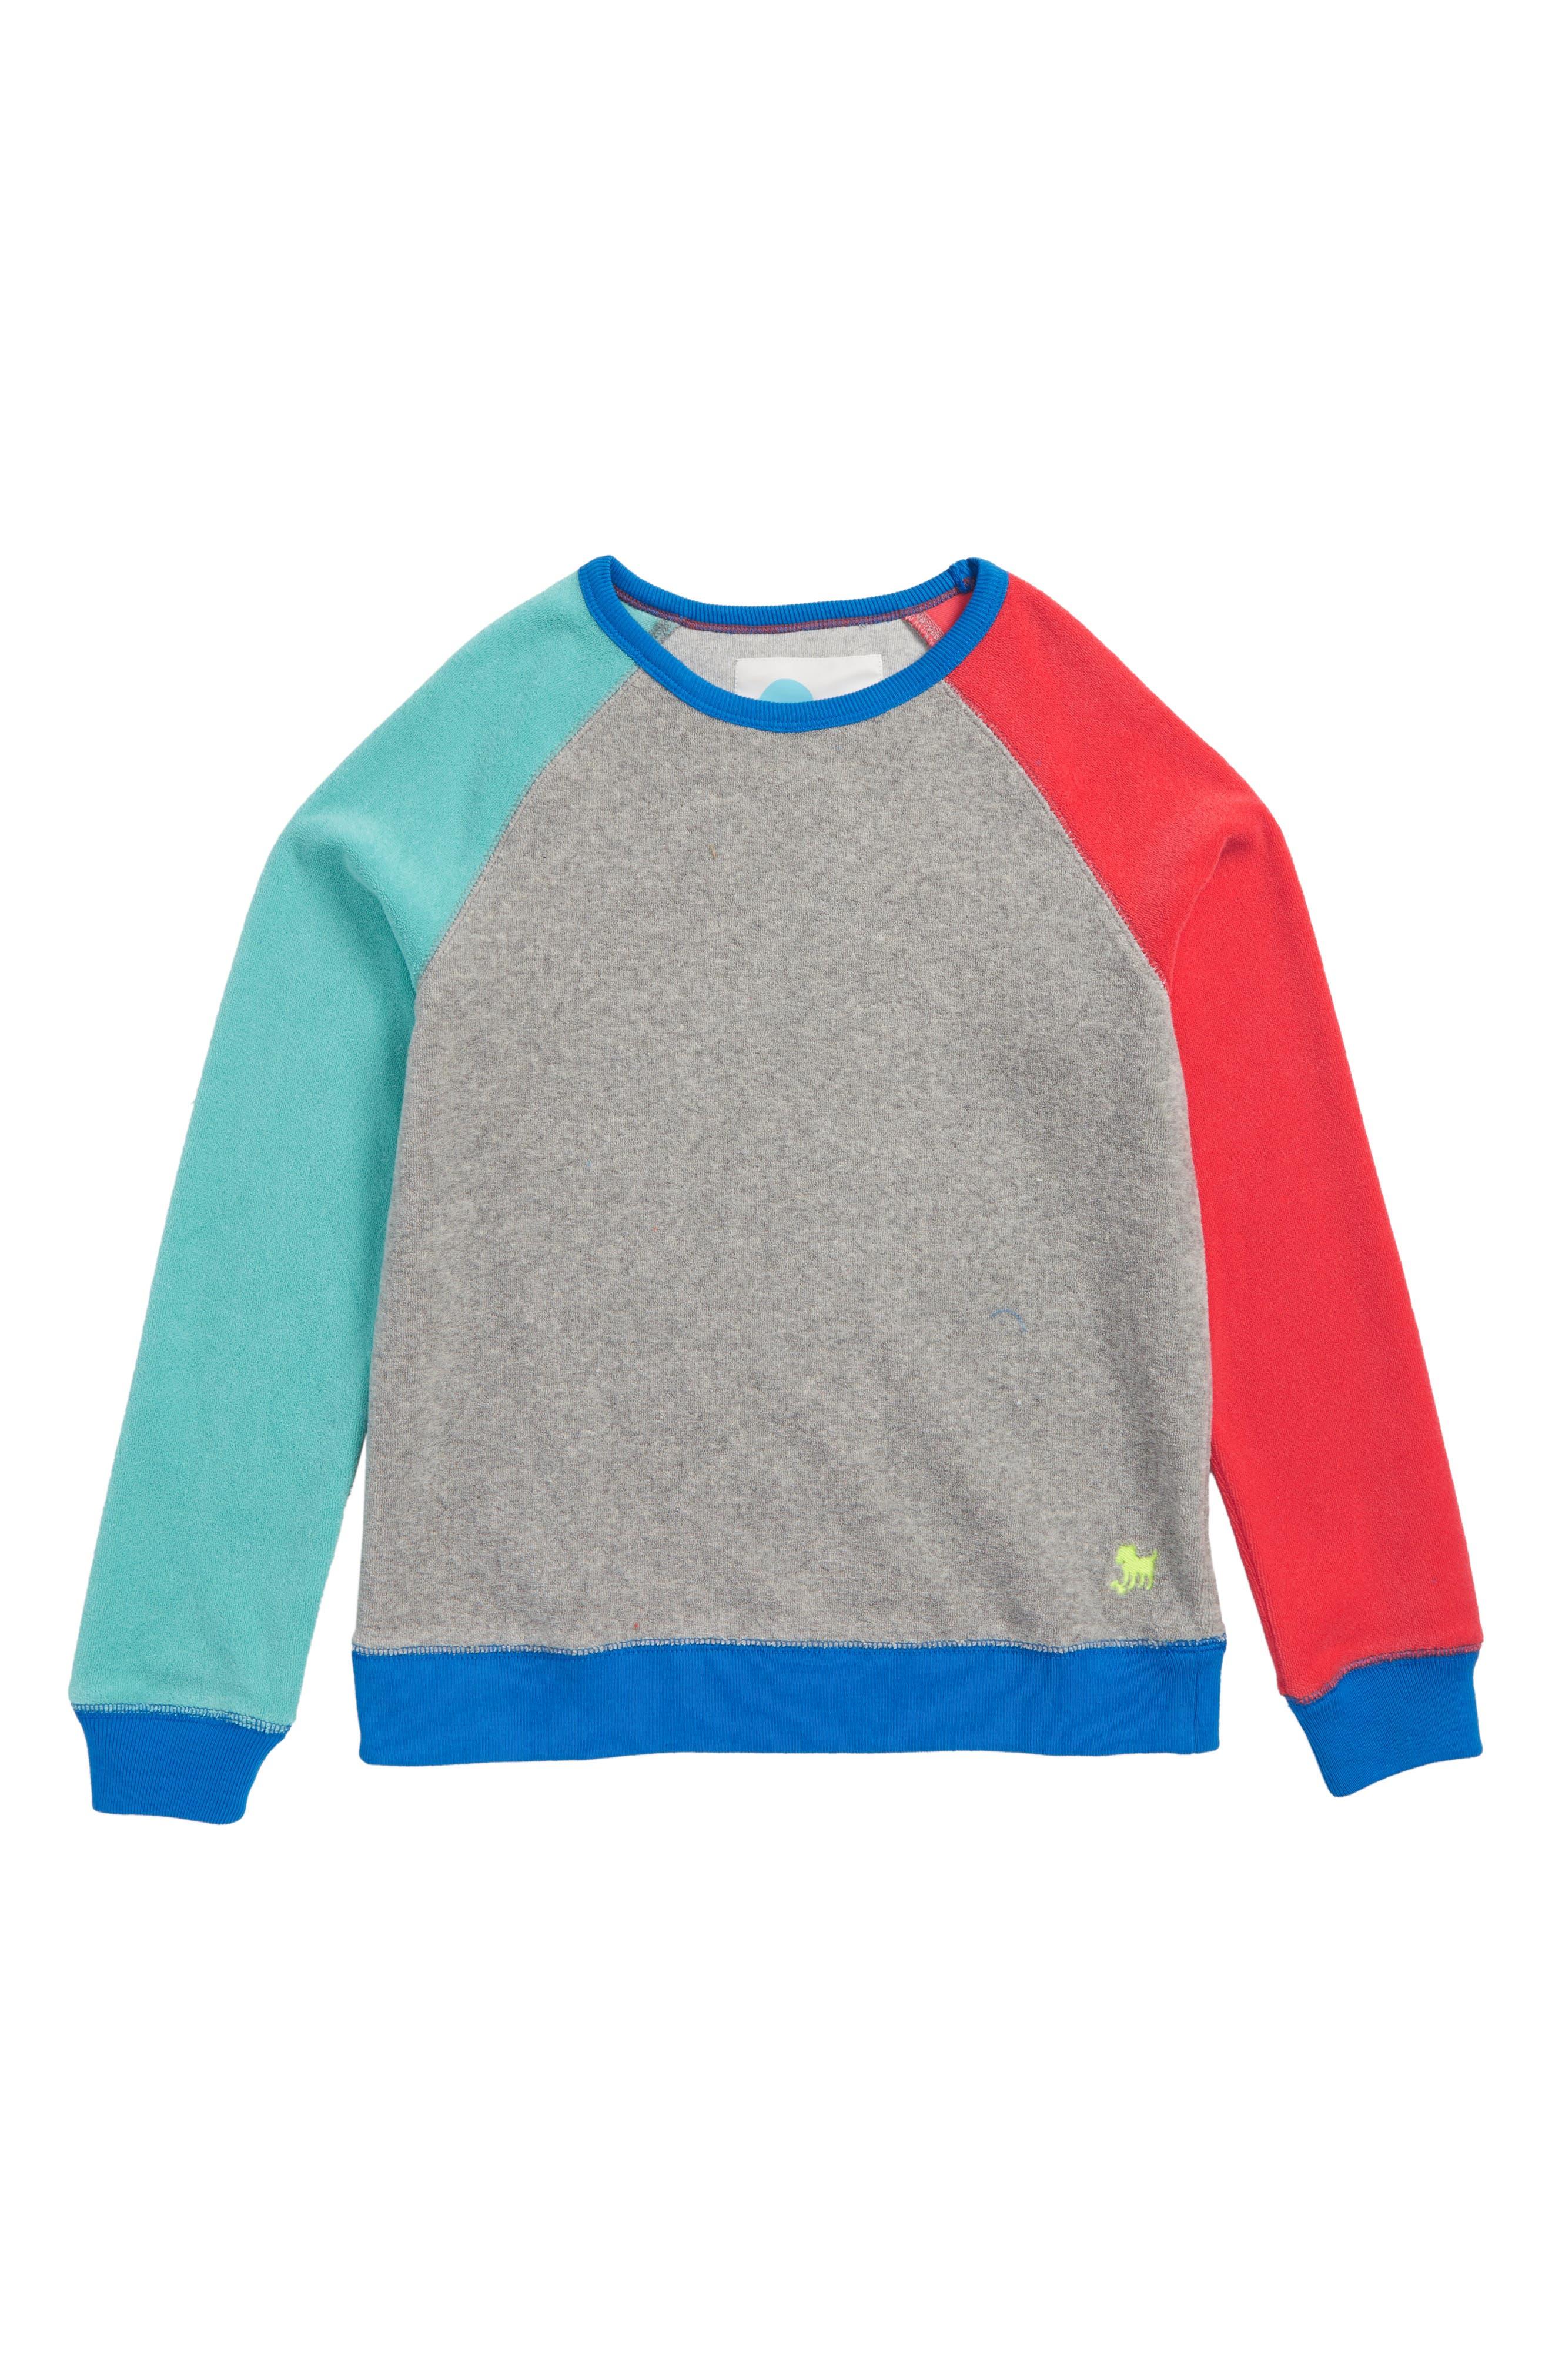 Toweling Sweatshirt,                             Main thumbnail 1, color,